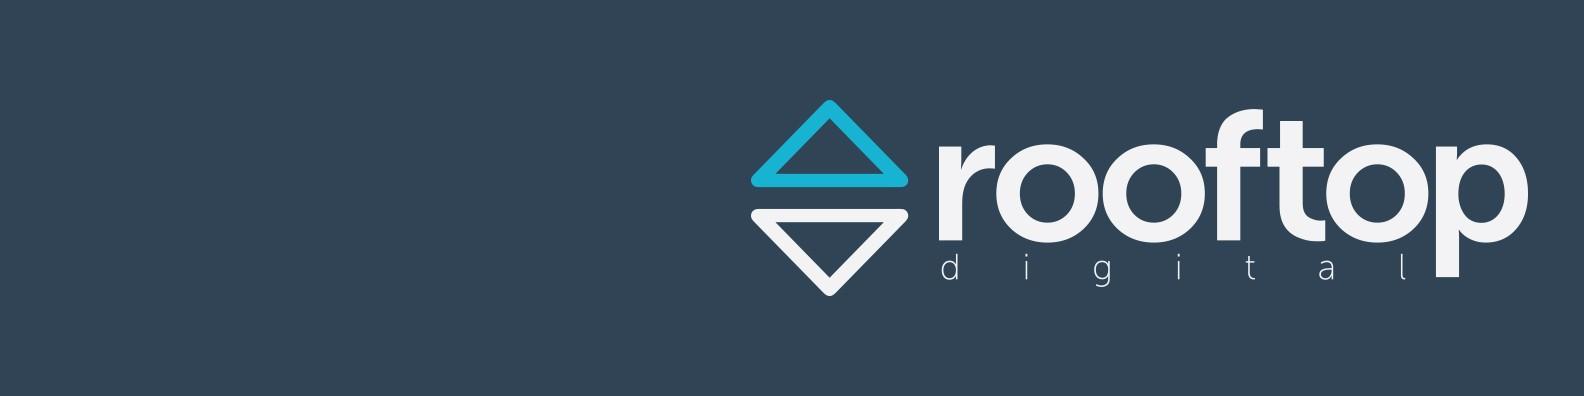 Rooftop Digital, LLC